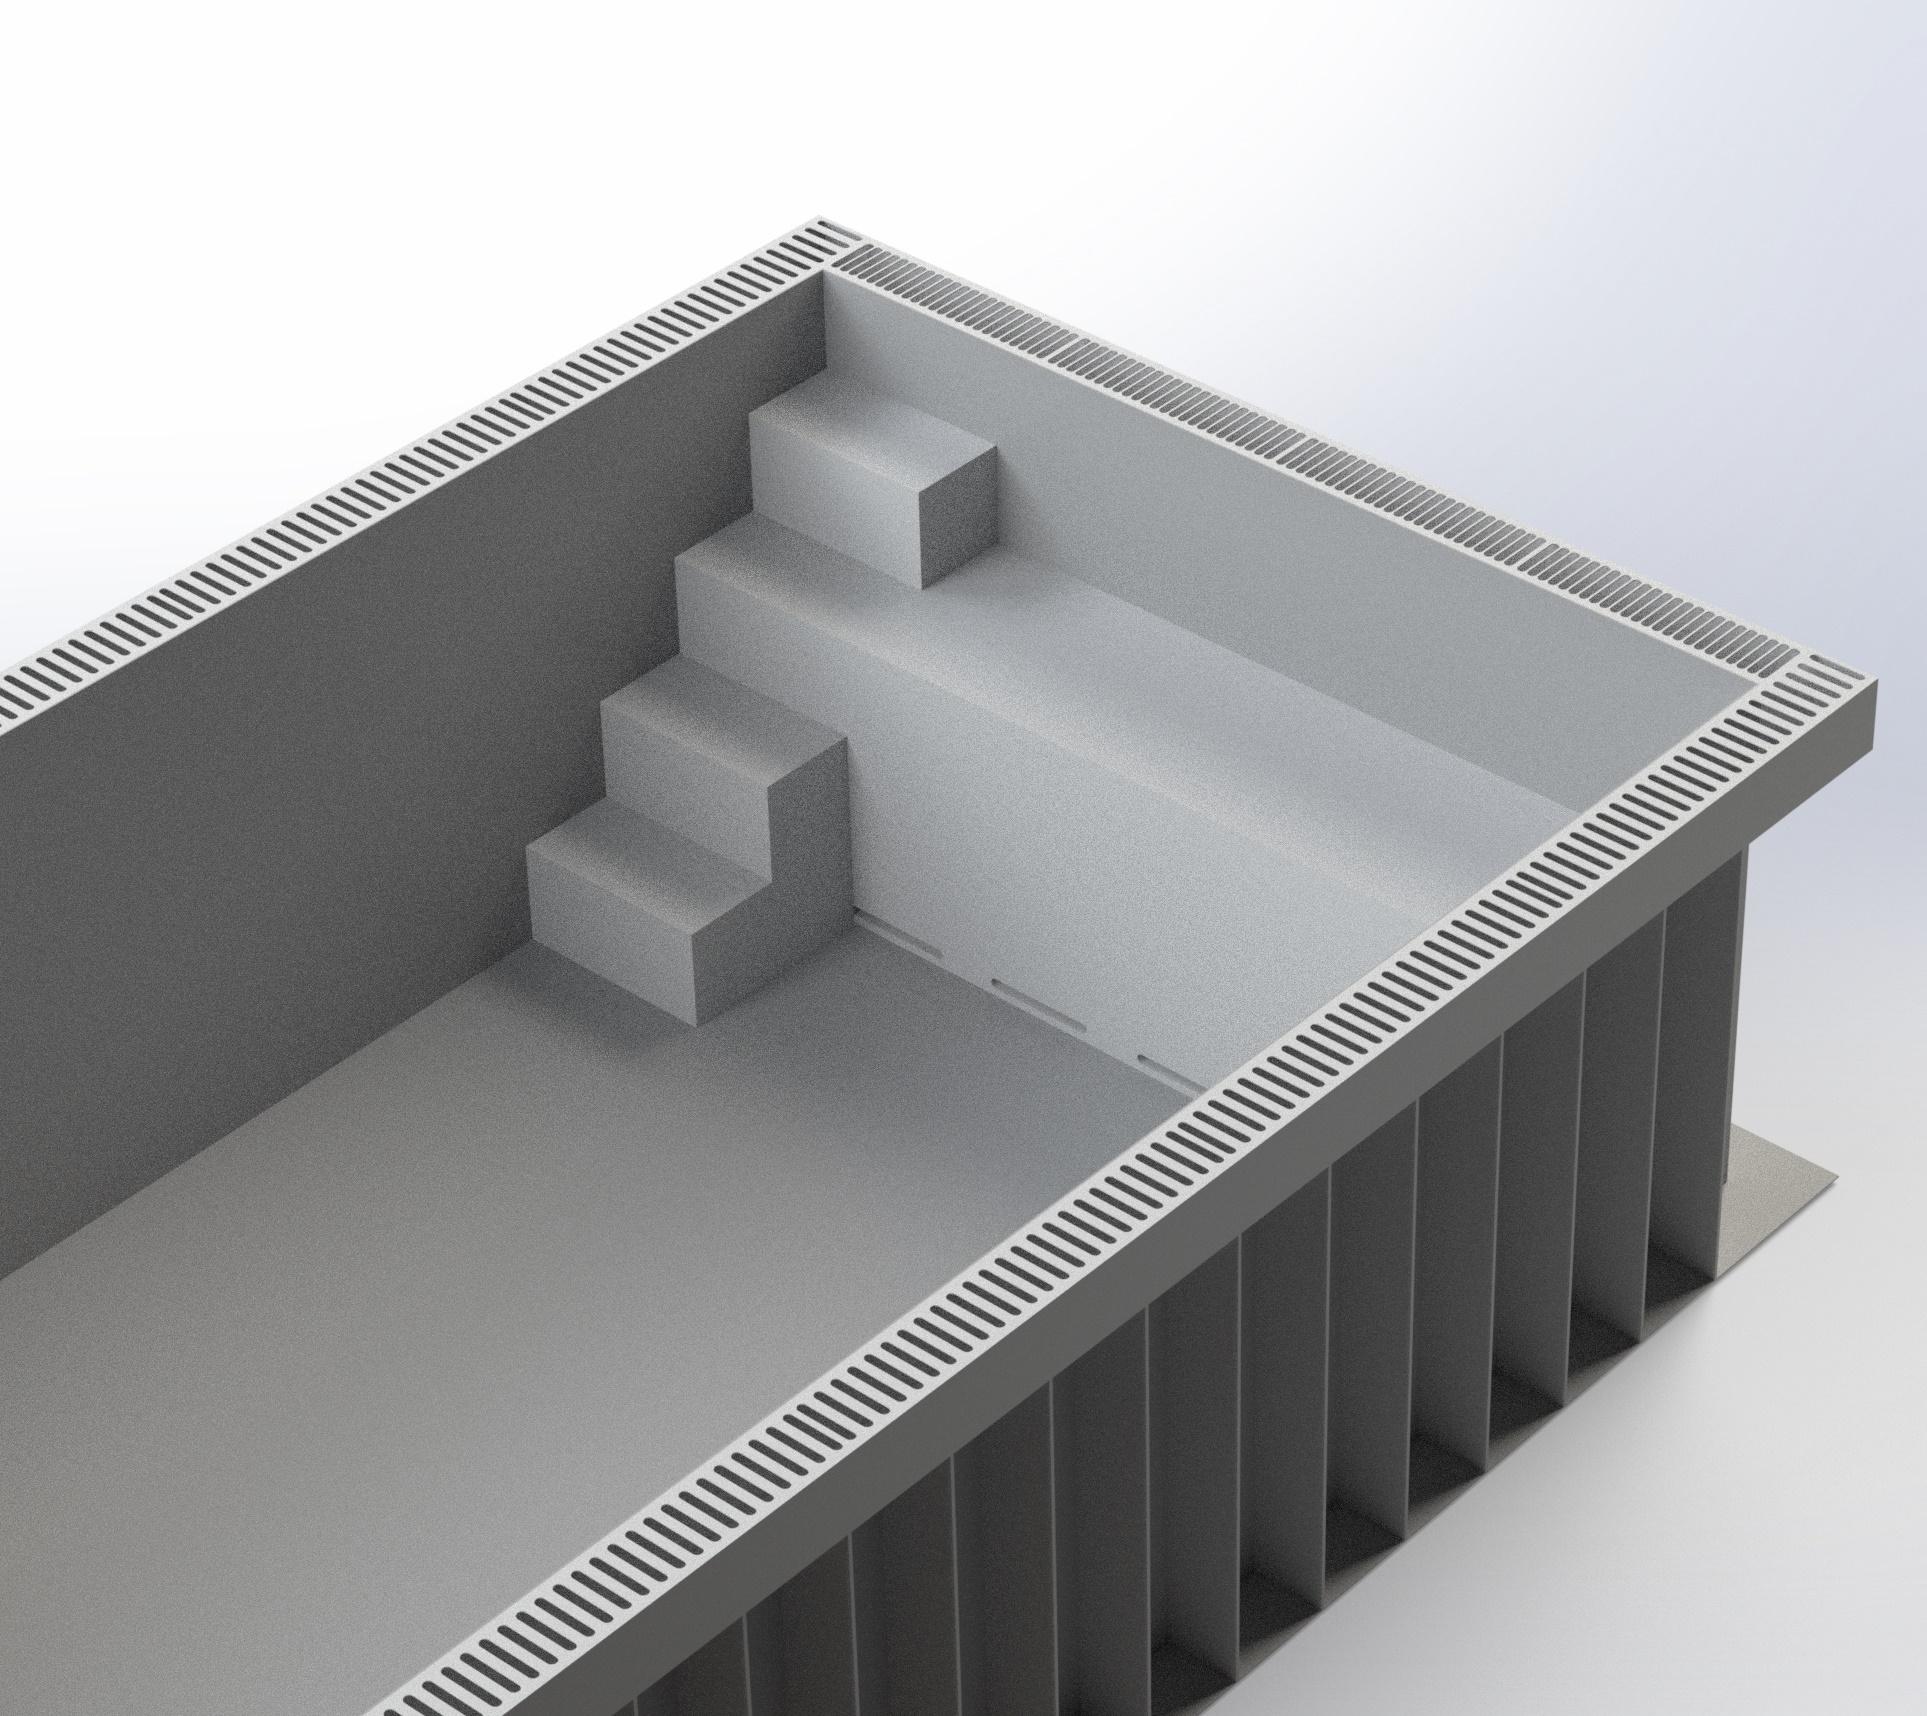 Rolloschacht-Variante-C-sitzbank-treppe